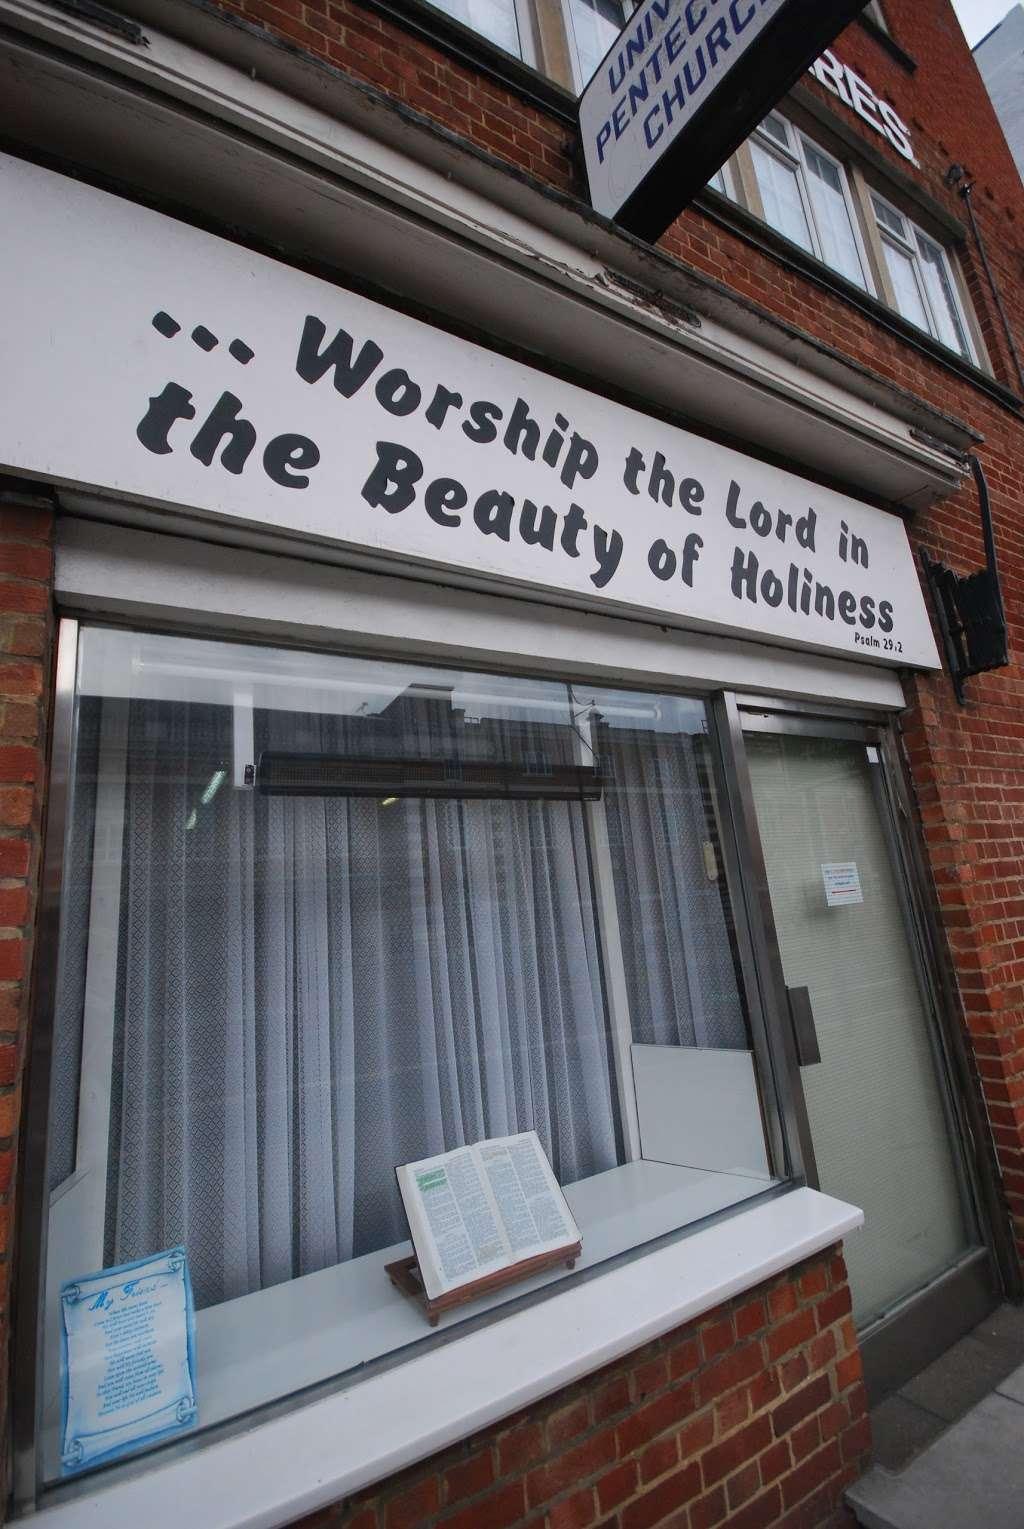 Universal Pentecostal Church - church    Photo 6 of 10   Address: 20 Acre Ln, Brixton, London SW2 5SG, UK   Phone: 020 7738 5566